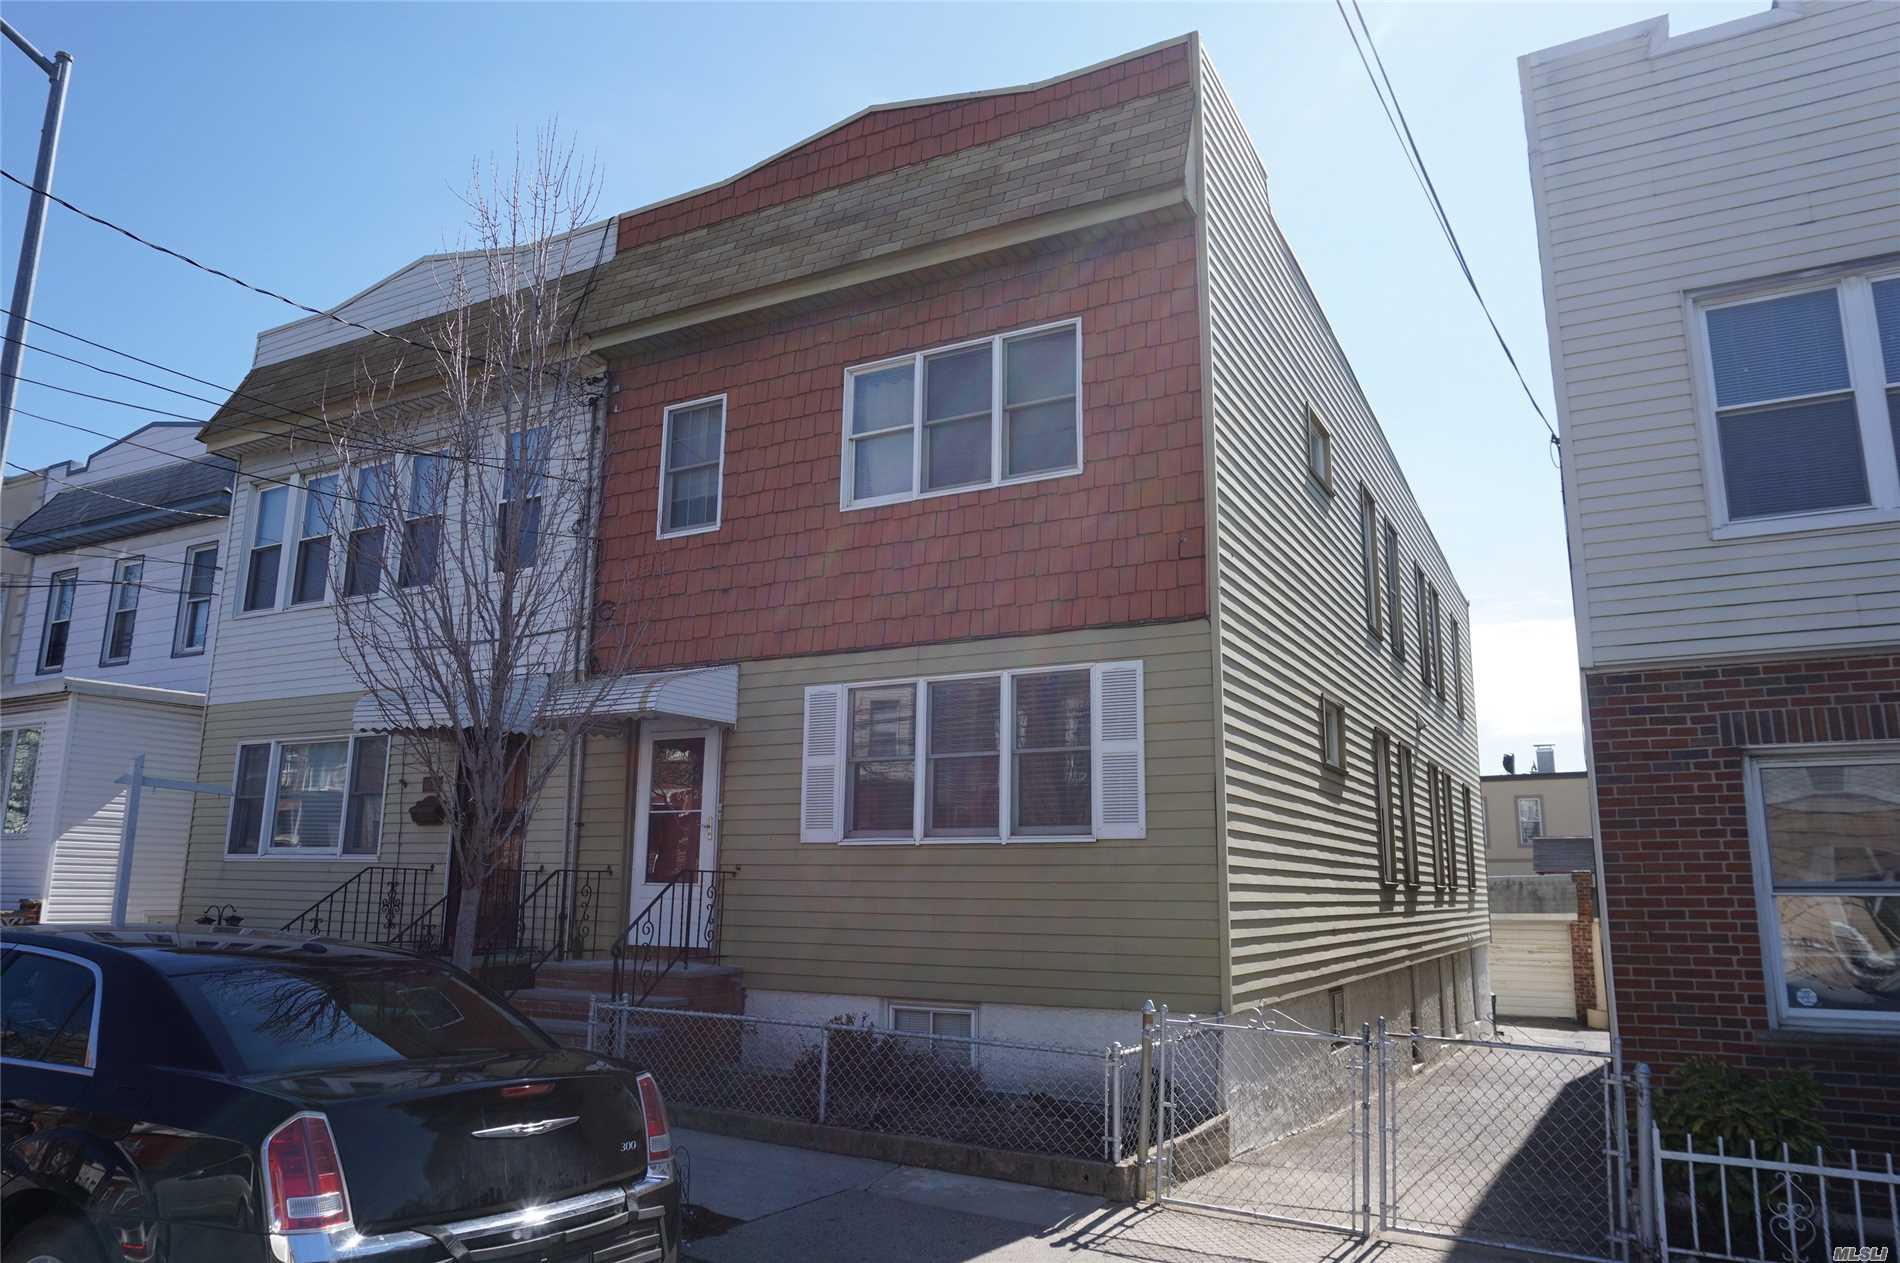 Property for sale at 66-24 Hull Avenue, Maspeth NY 11378, Maspeth,  New York 11378